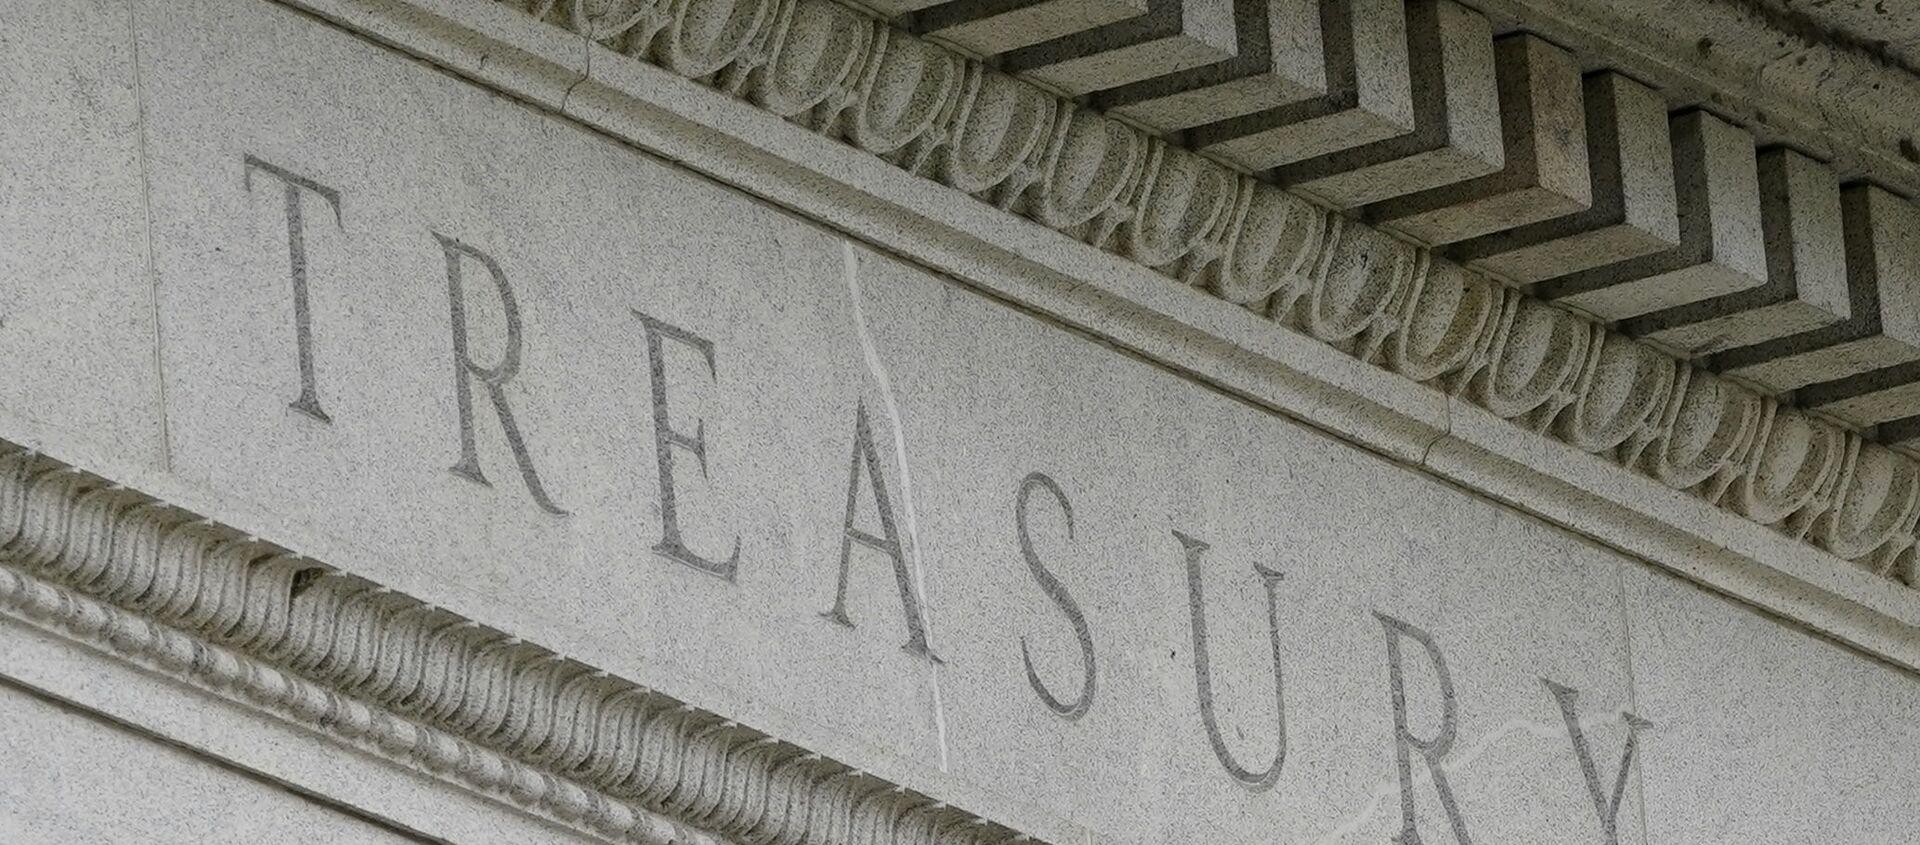 This May 4, 2021 file photo shows the Treasury Building in Washington - Sputnik International, 1920, 03.09.2021